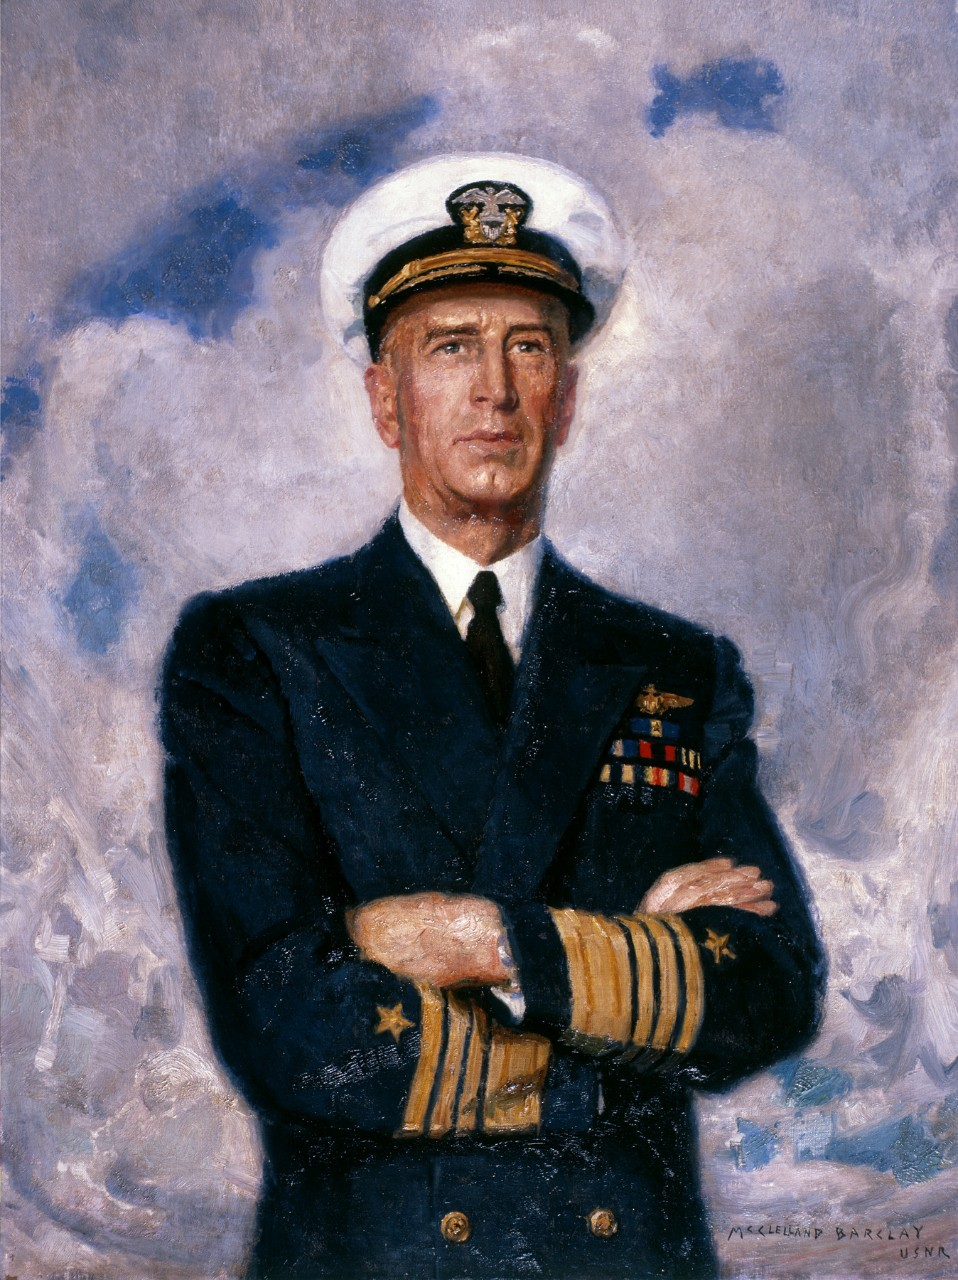 Fleet Admiral Ernest J King